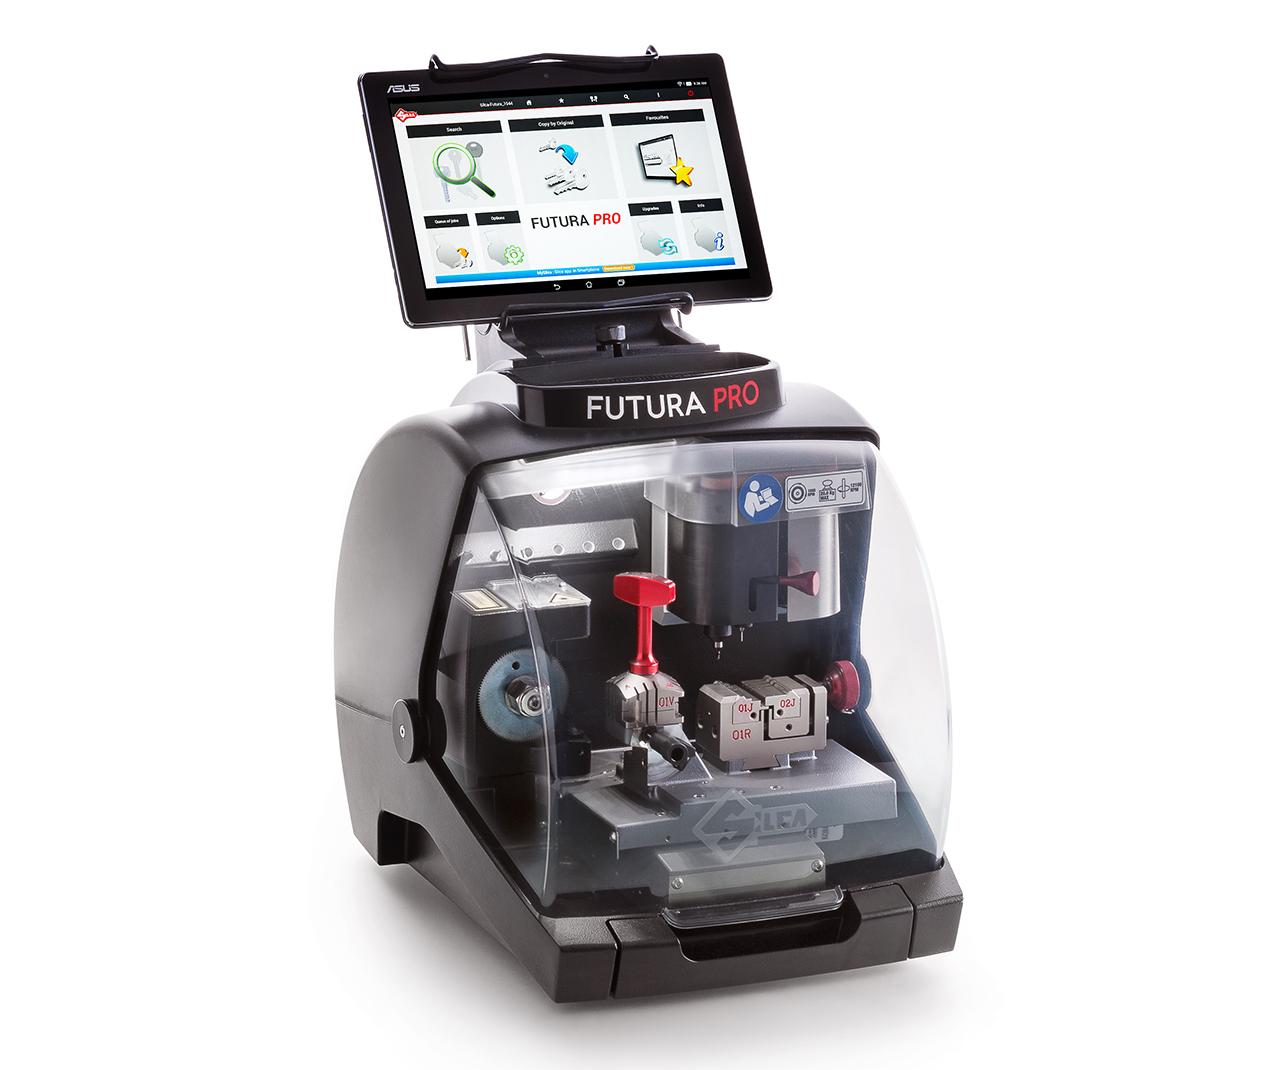 Silca Futura Pro Engraving Unlimited megérkezett